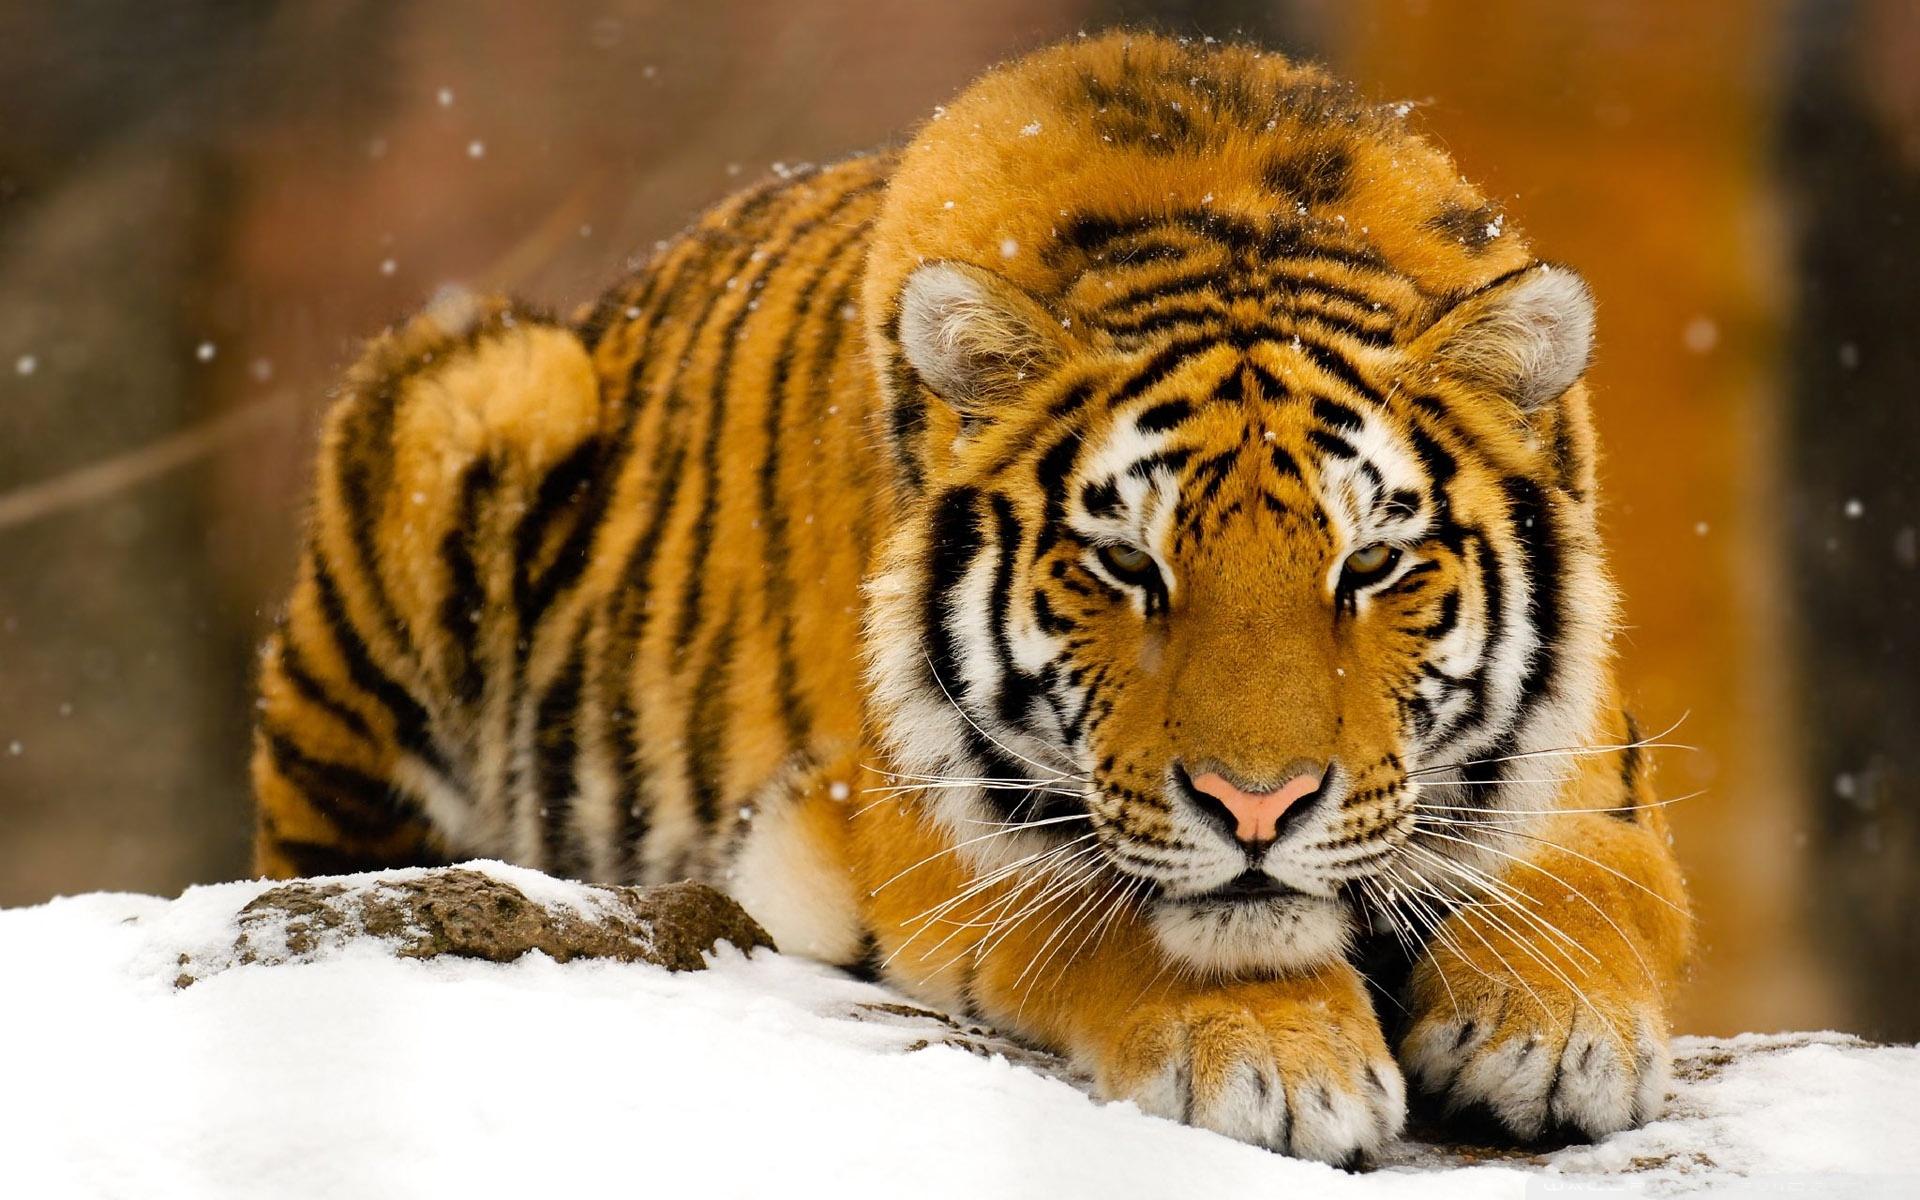 siberian_tiger_in_snow-wallpaper-1920x1200